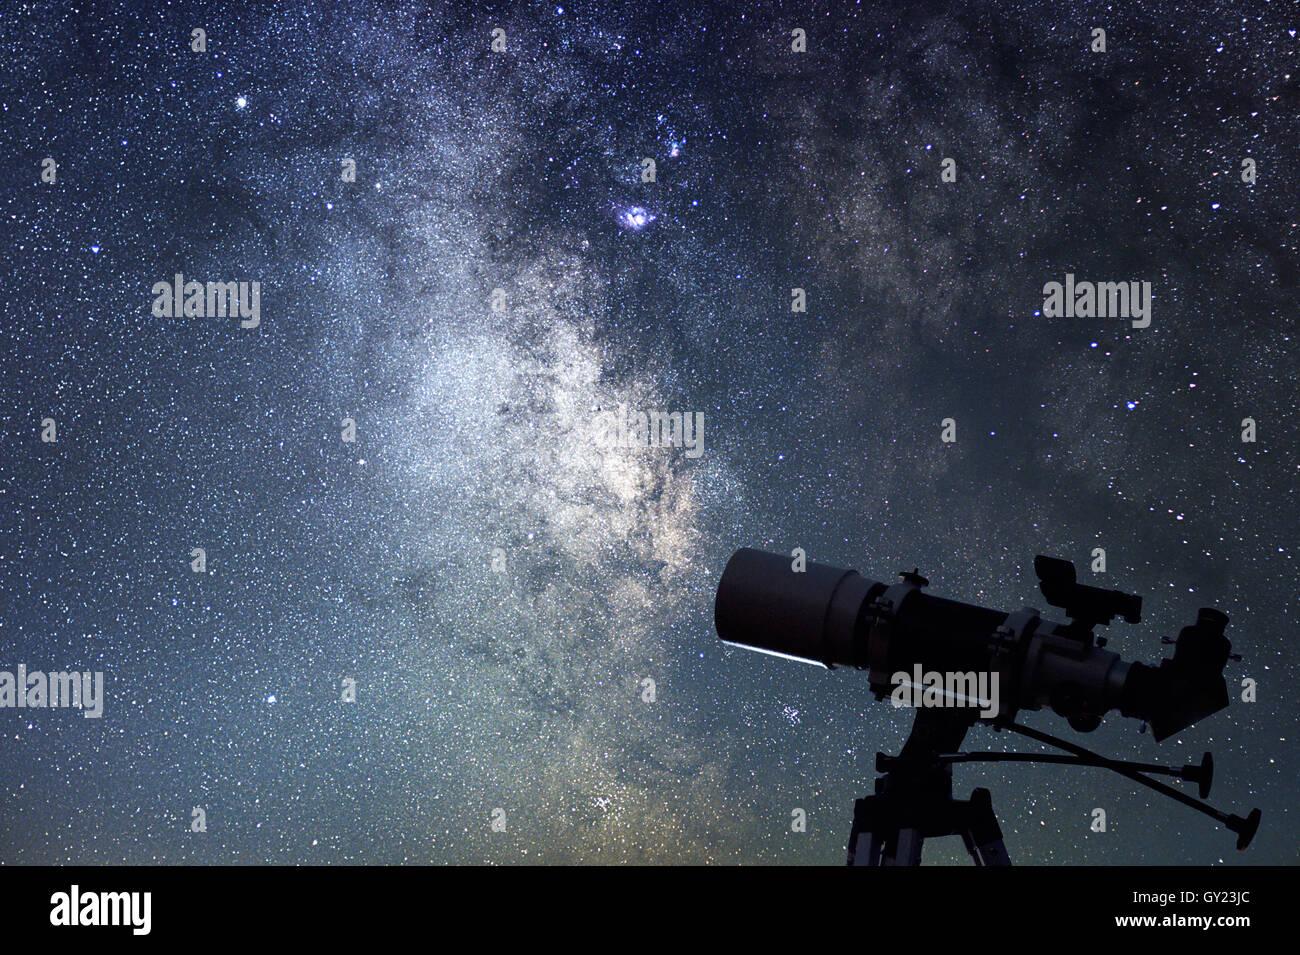 Telescope in starry night. Milky way and telescope. Astronomy - Stock Image